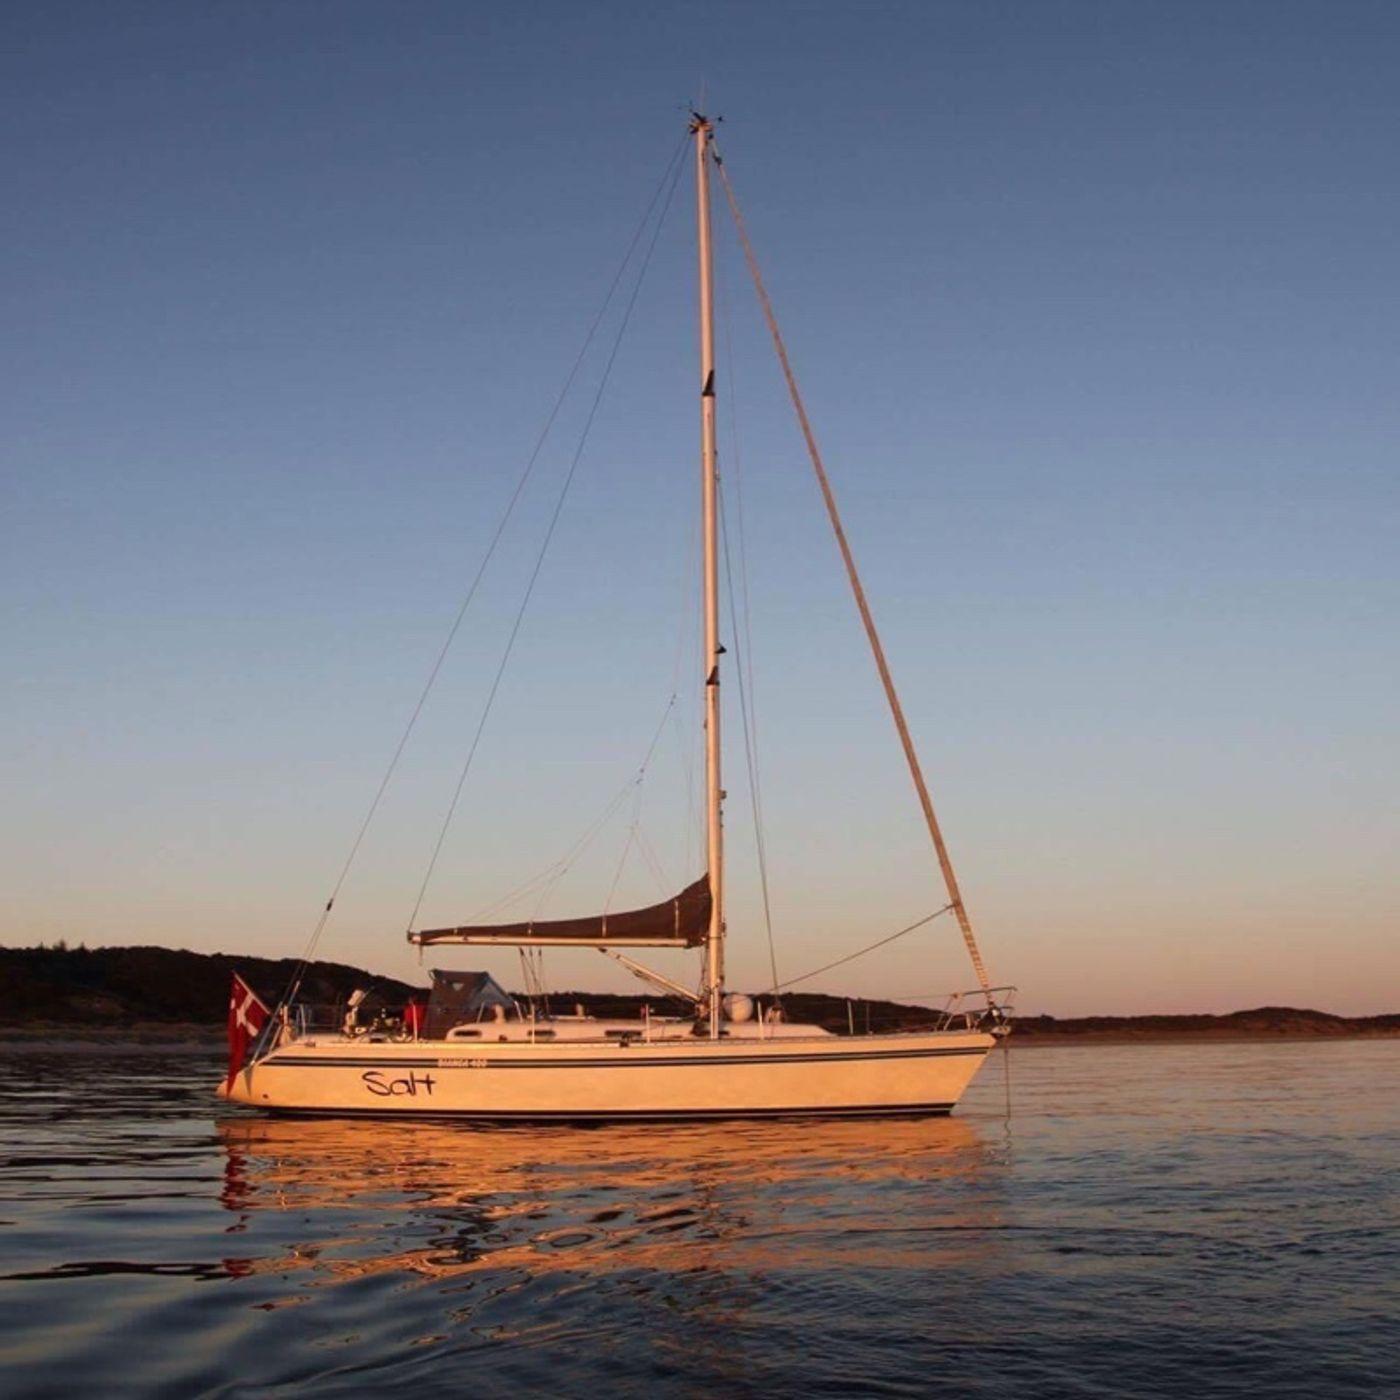 Jesper sejler om vinteren - 11.2020